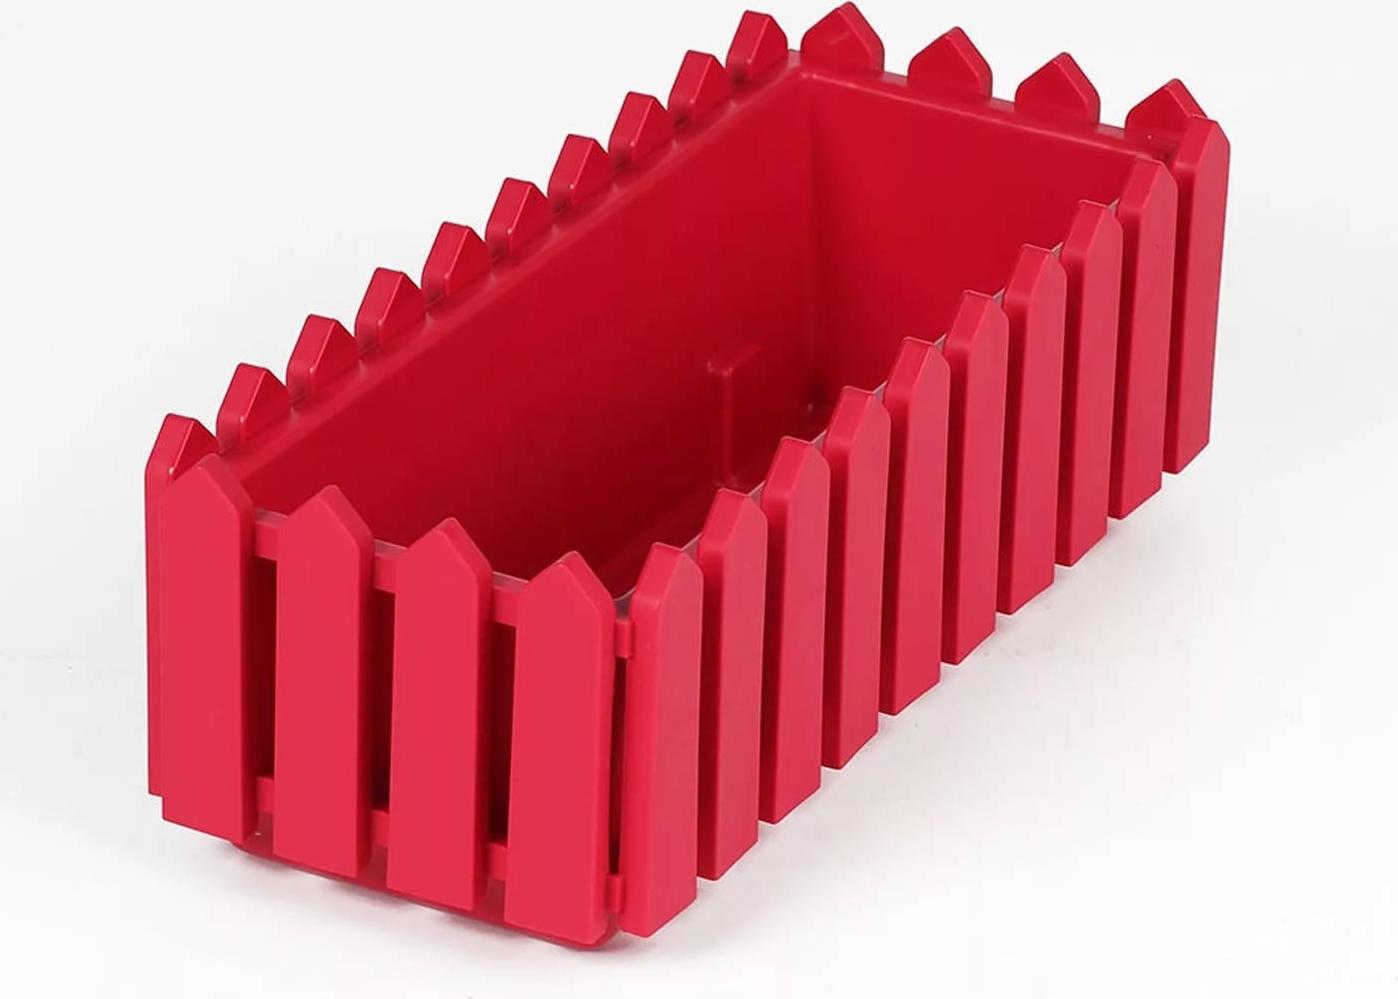 Балконный ящик Элластик-Пласт Лардо, с поддоном, ЭП 012931, красный, 47 х 19,2 х 16 см цена